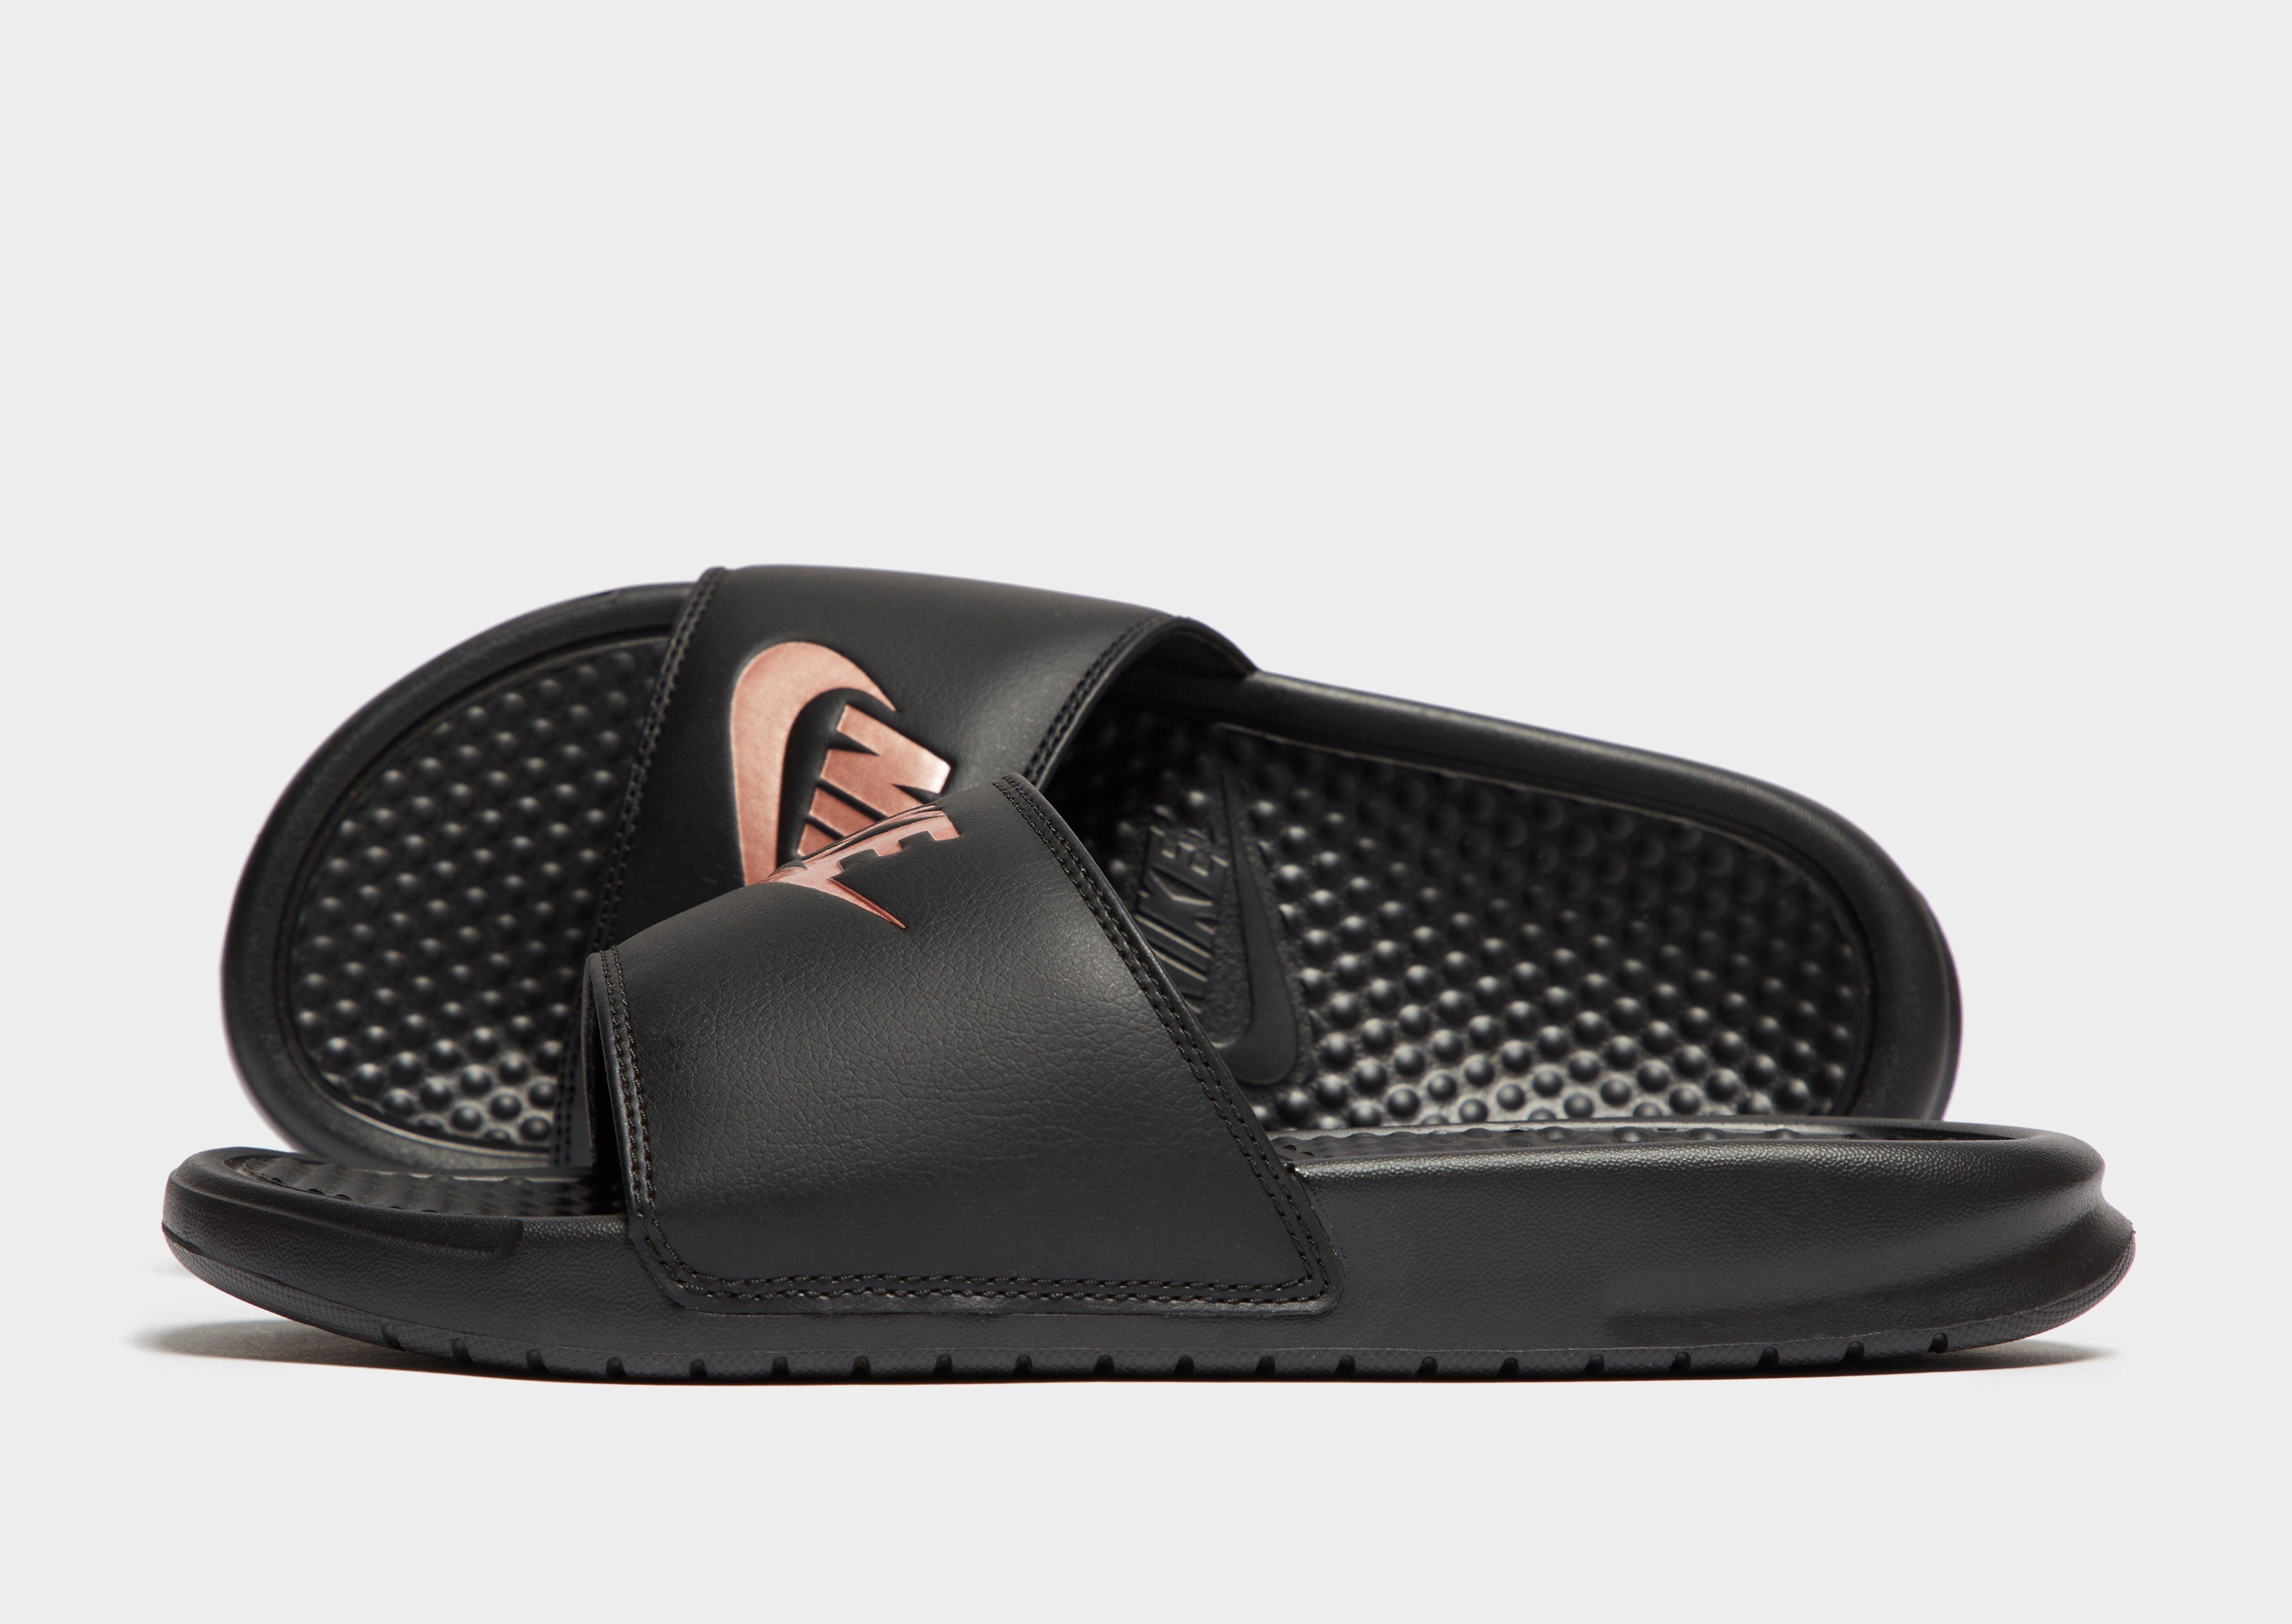 chupar Énfasis anfitrión  Compra Nike Benassi Just Do It Slides Women's en Negro